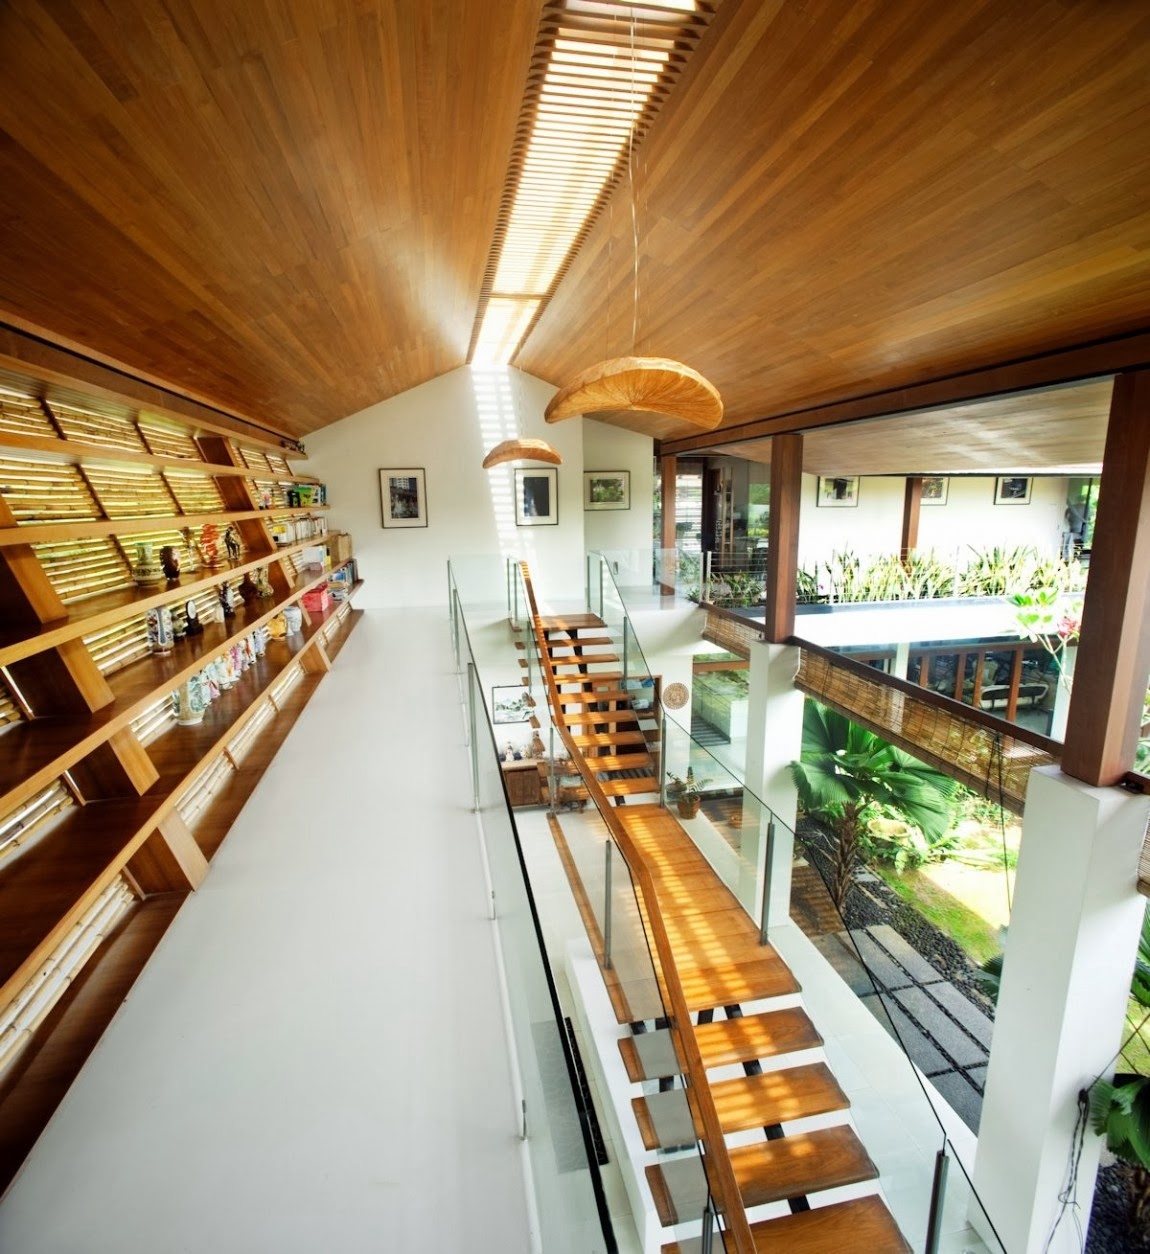 The Sun House By Guz Architects A Hevean Of Green In: Okokno : Sun House By Guz Architects